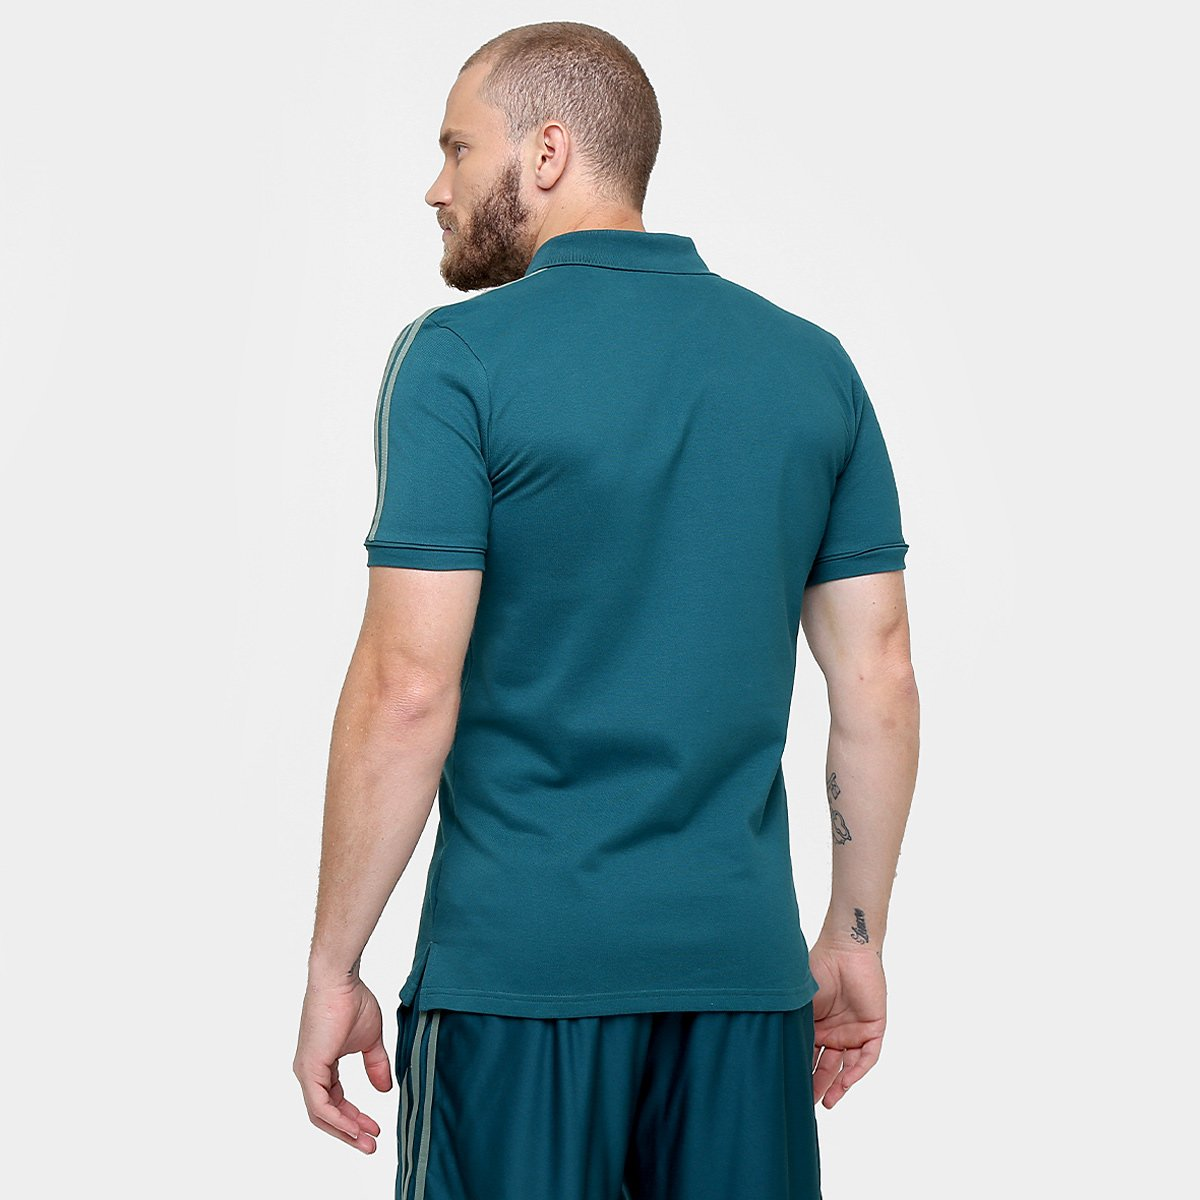 e9ba02cdee Camisa Polo Palmeiras Adidas Viagem 17 18 Masculino - Verde - Compre ...